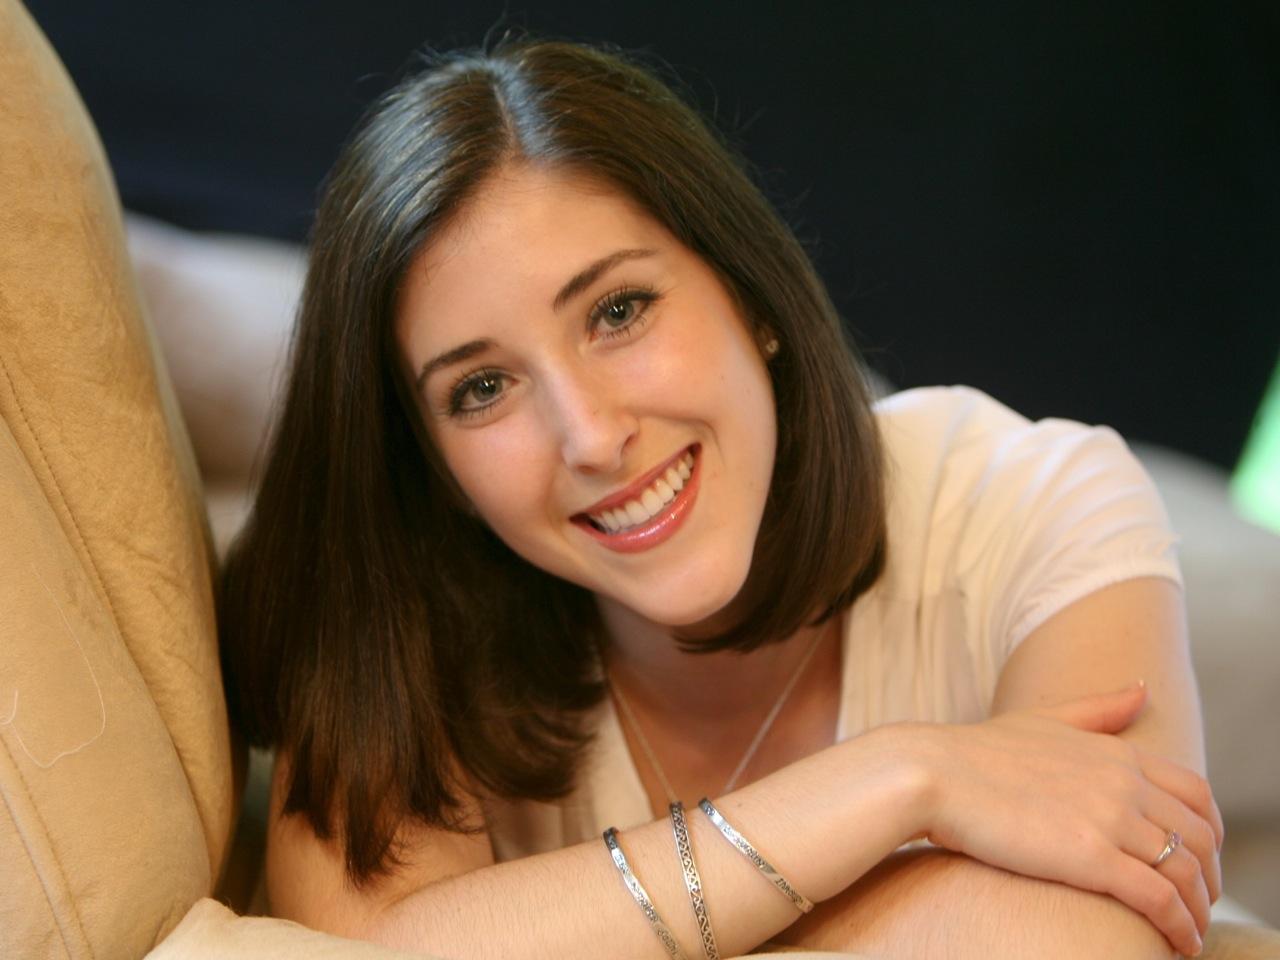 Lauren+Gessner By a large margin, teen internet users' favorite online activity is game ...